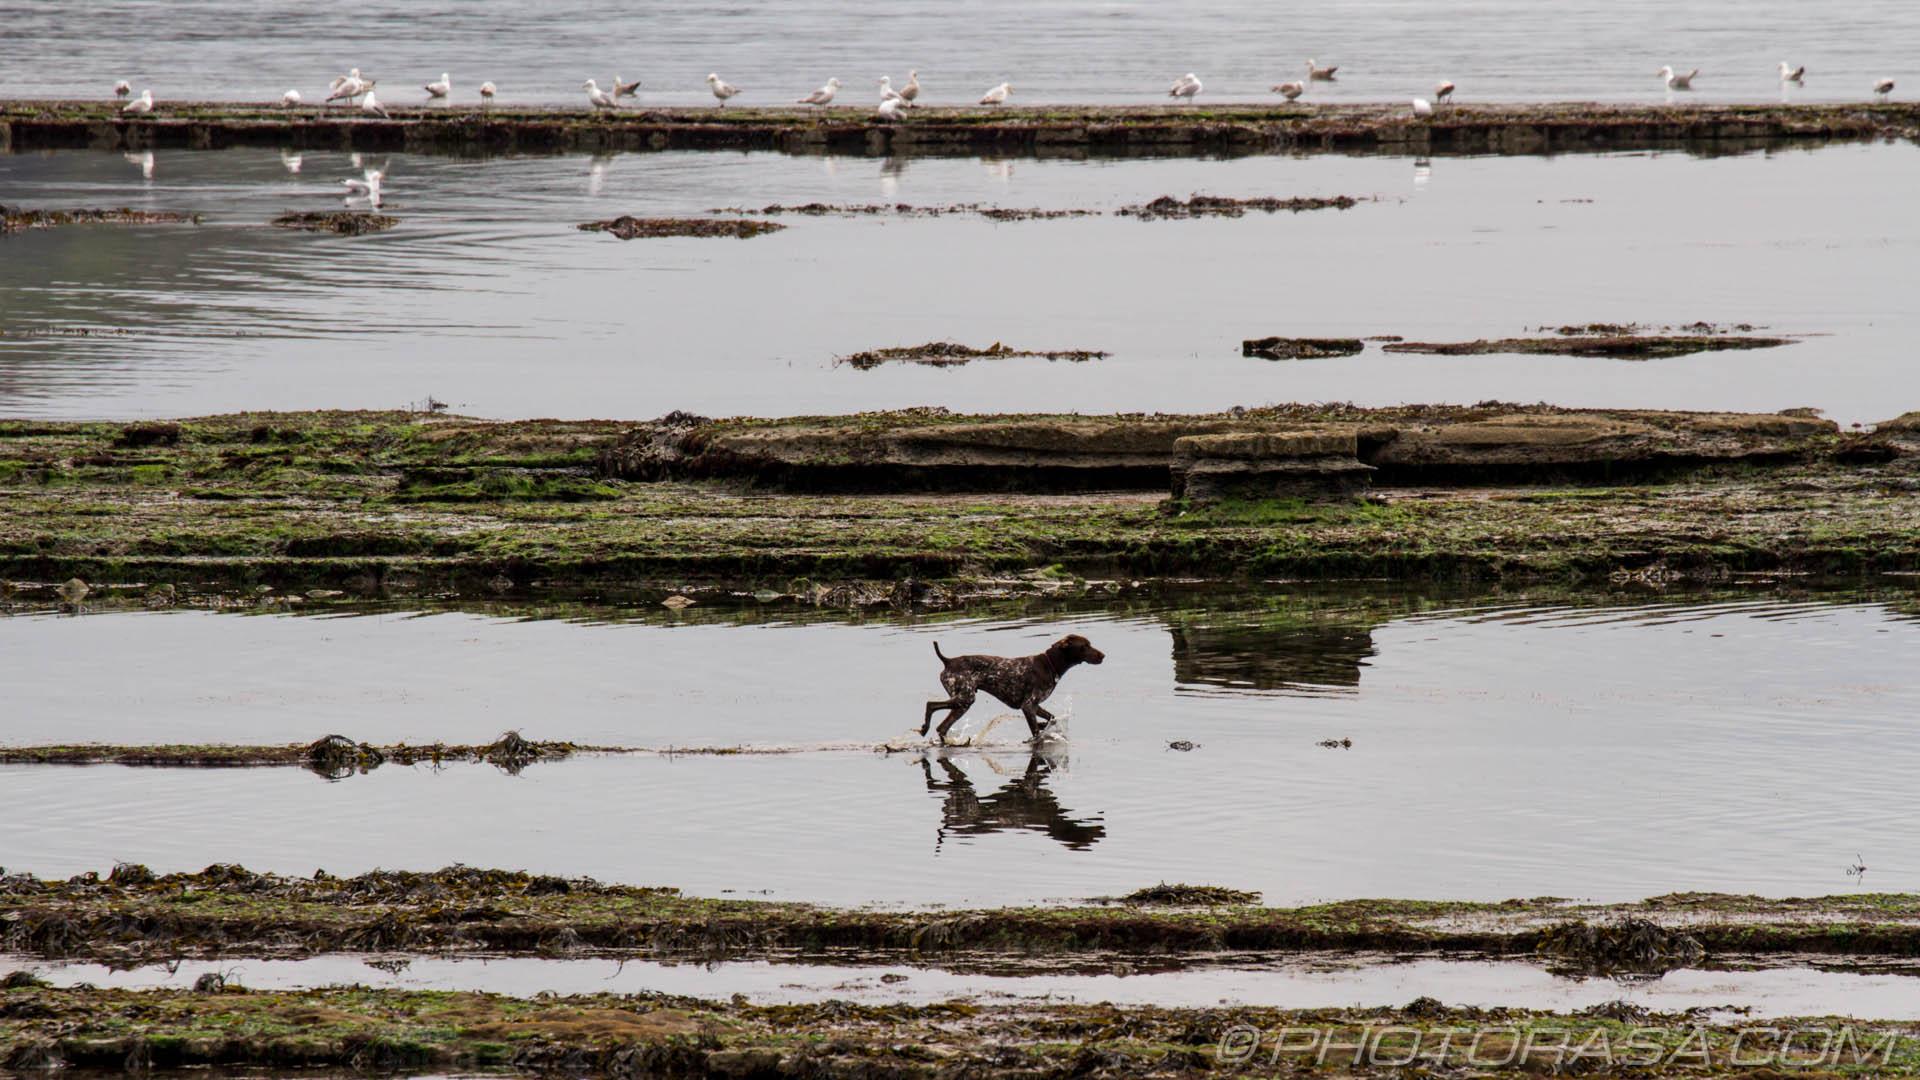 https://photorasa.com/walking-dog-jurassic-coast/dog-splashing-about/